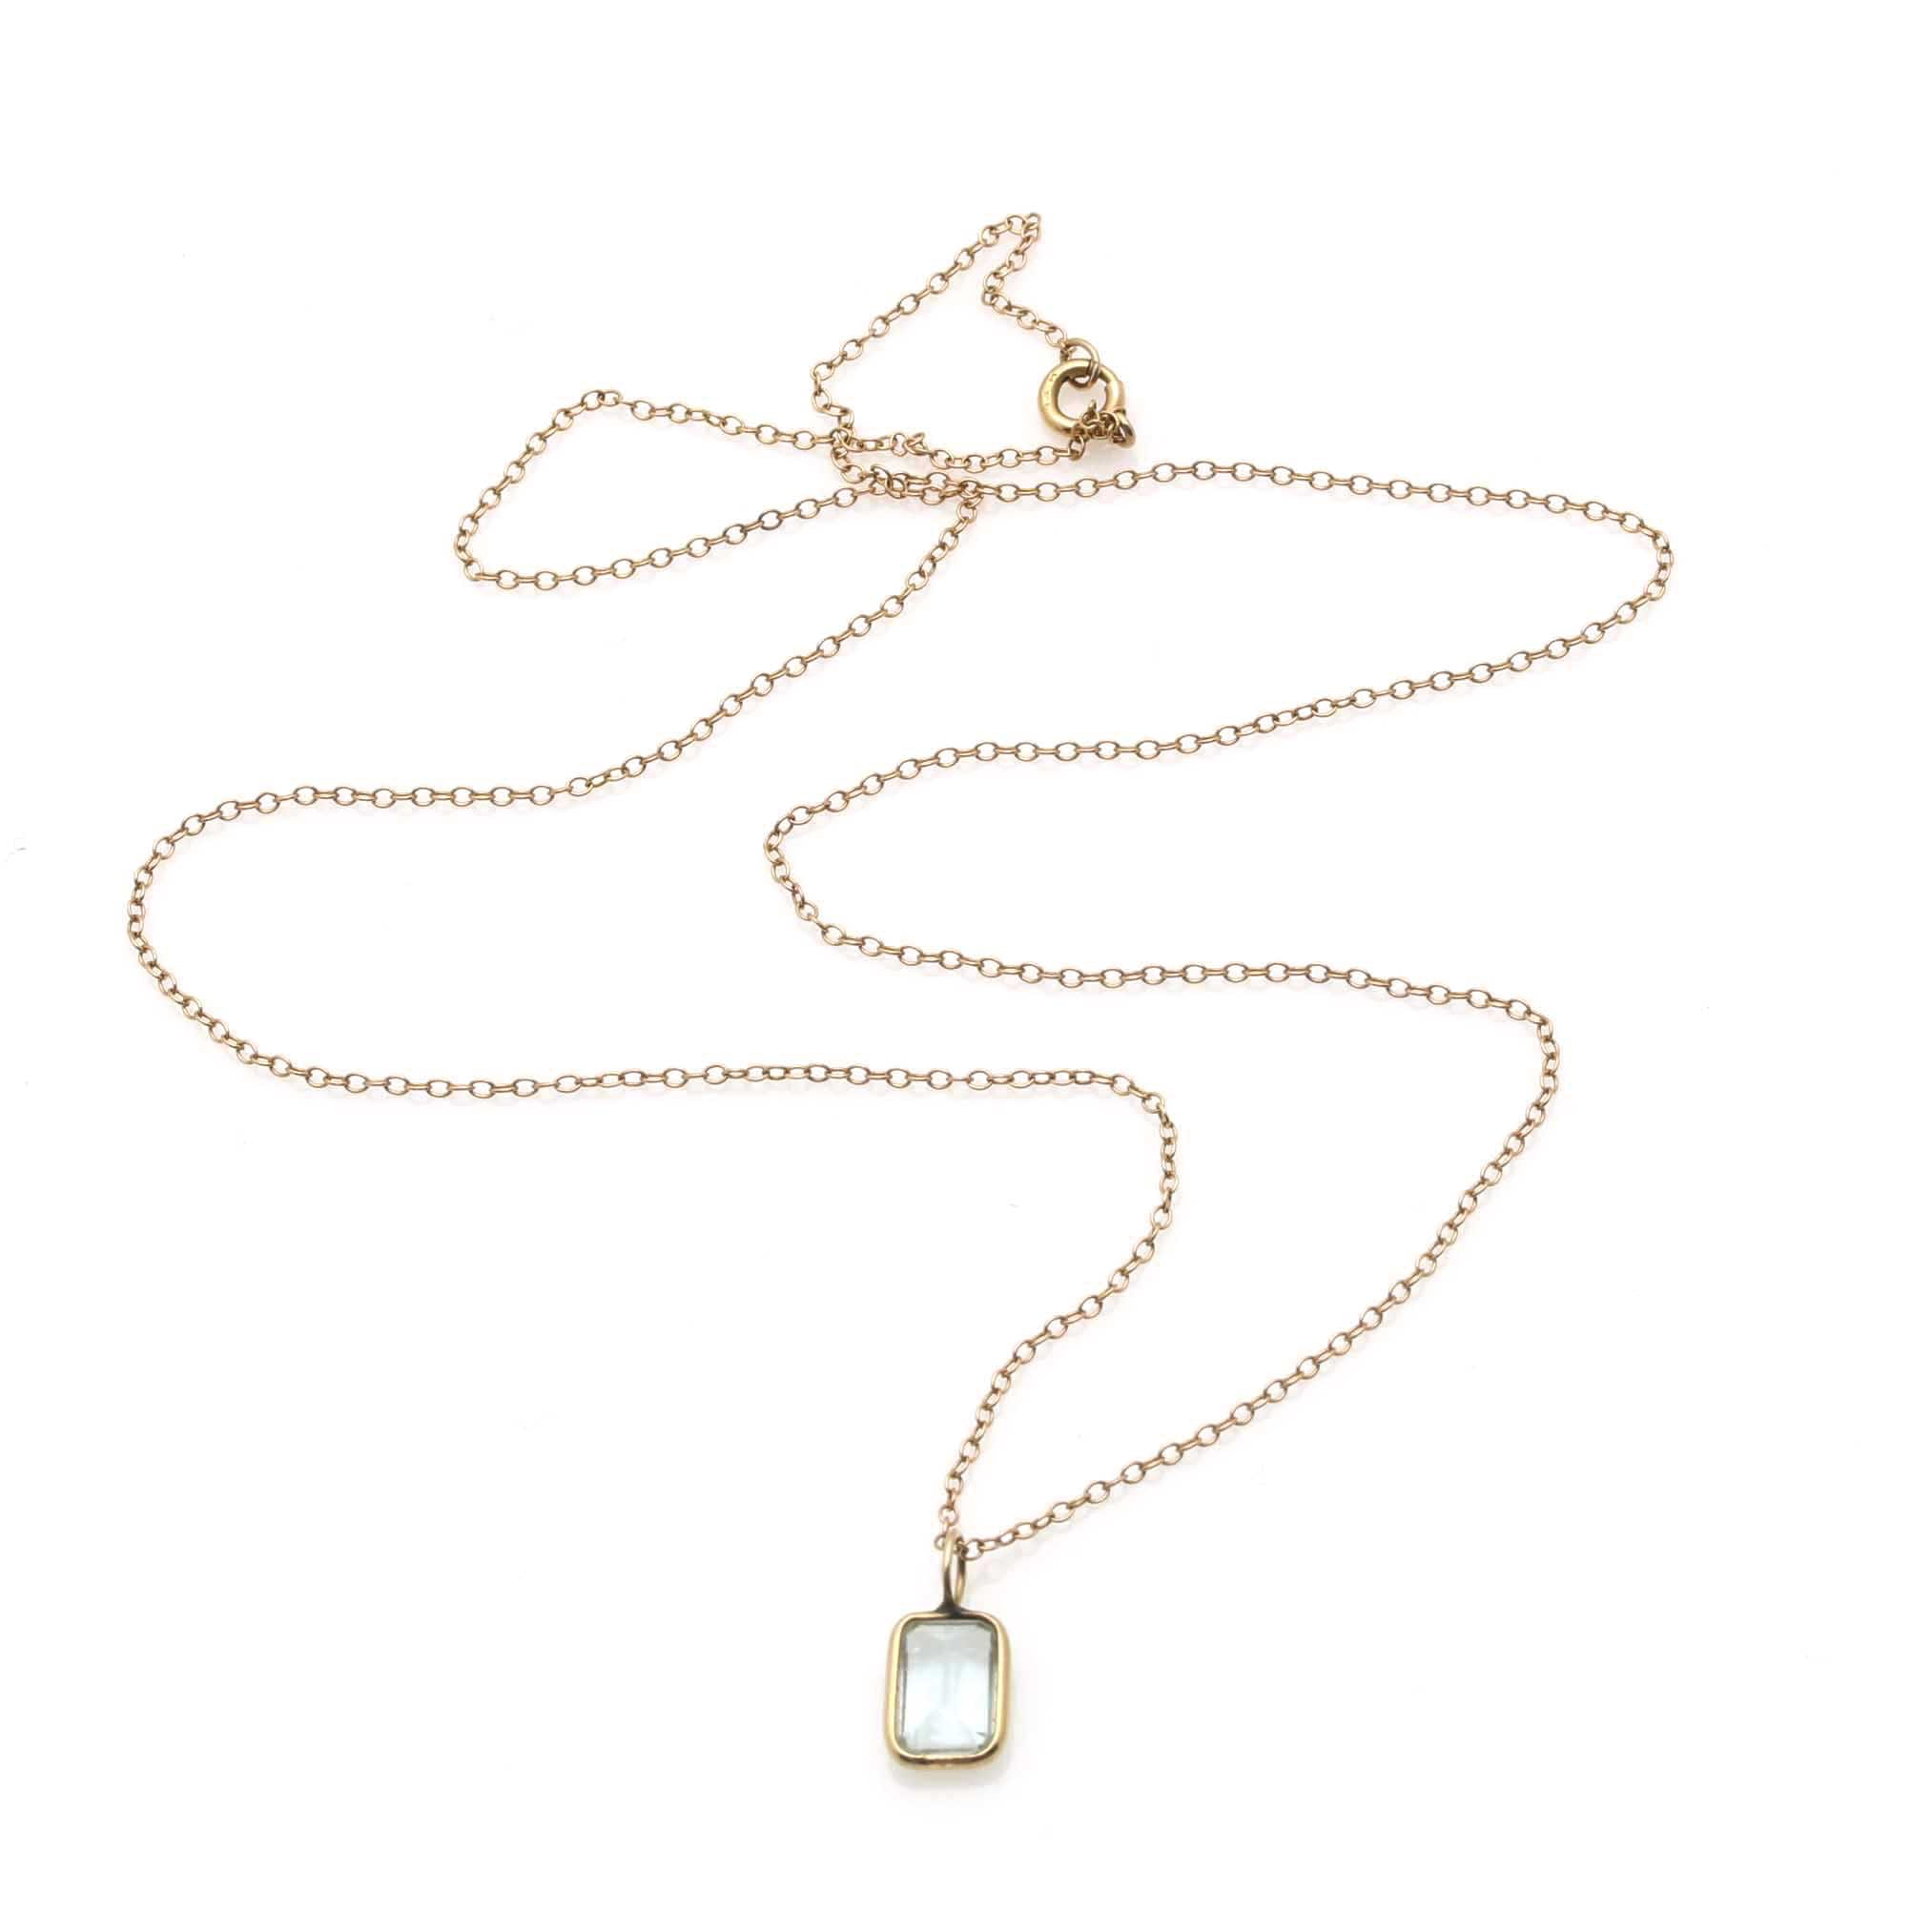 14K Yellow Gold Necklace with Aquamarine Pendant